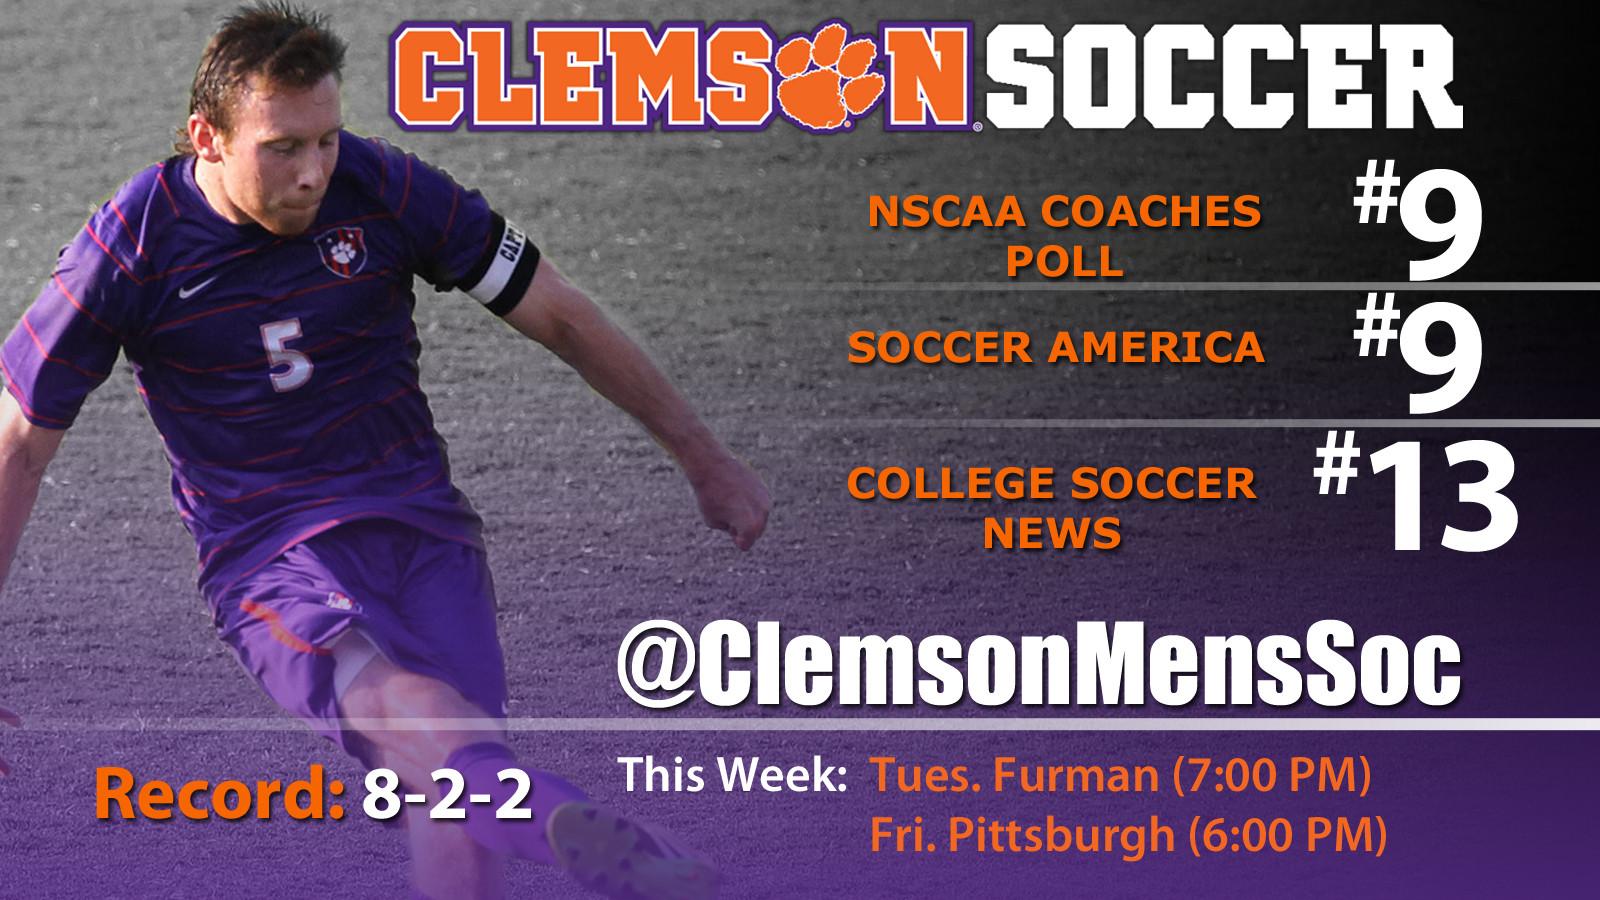 Clemson Men?s Soccer Ranked Ninth